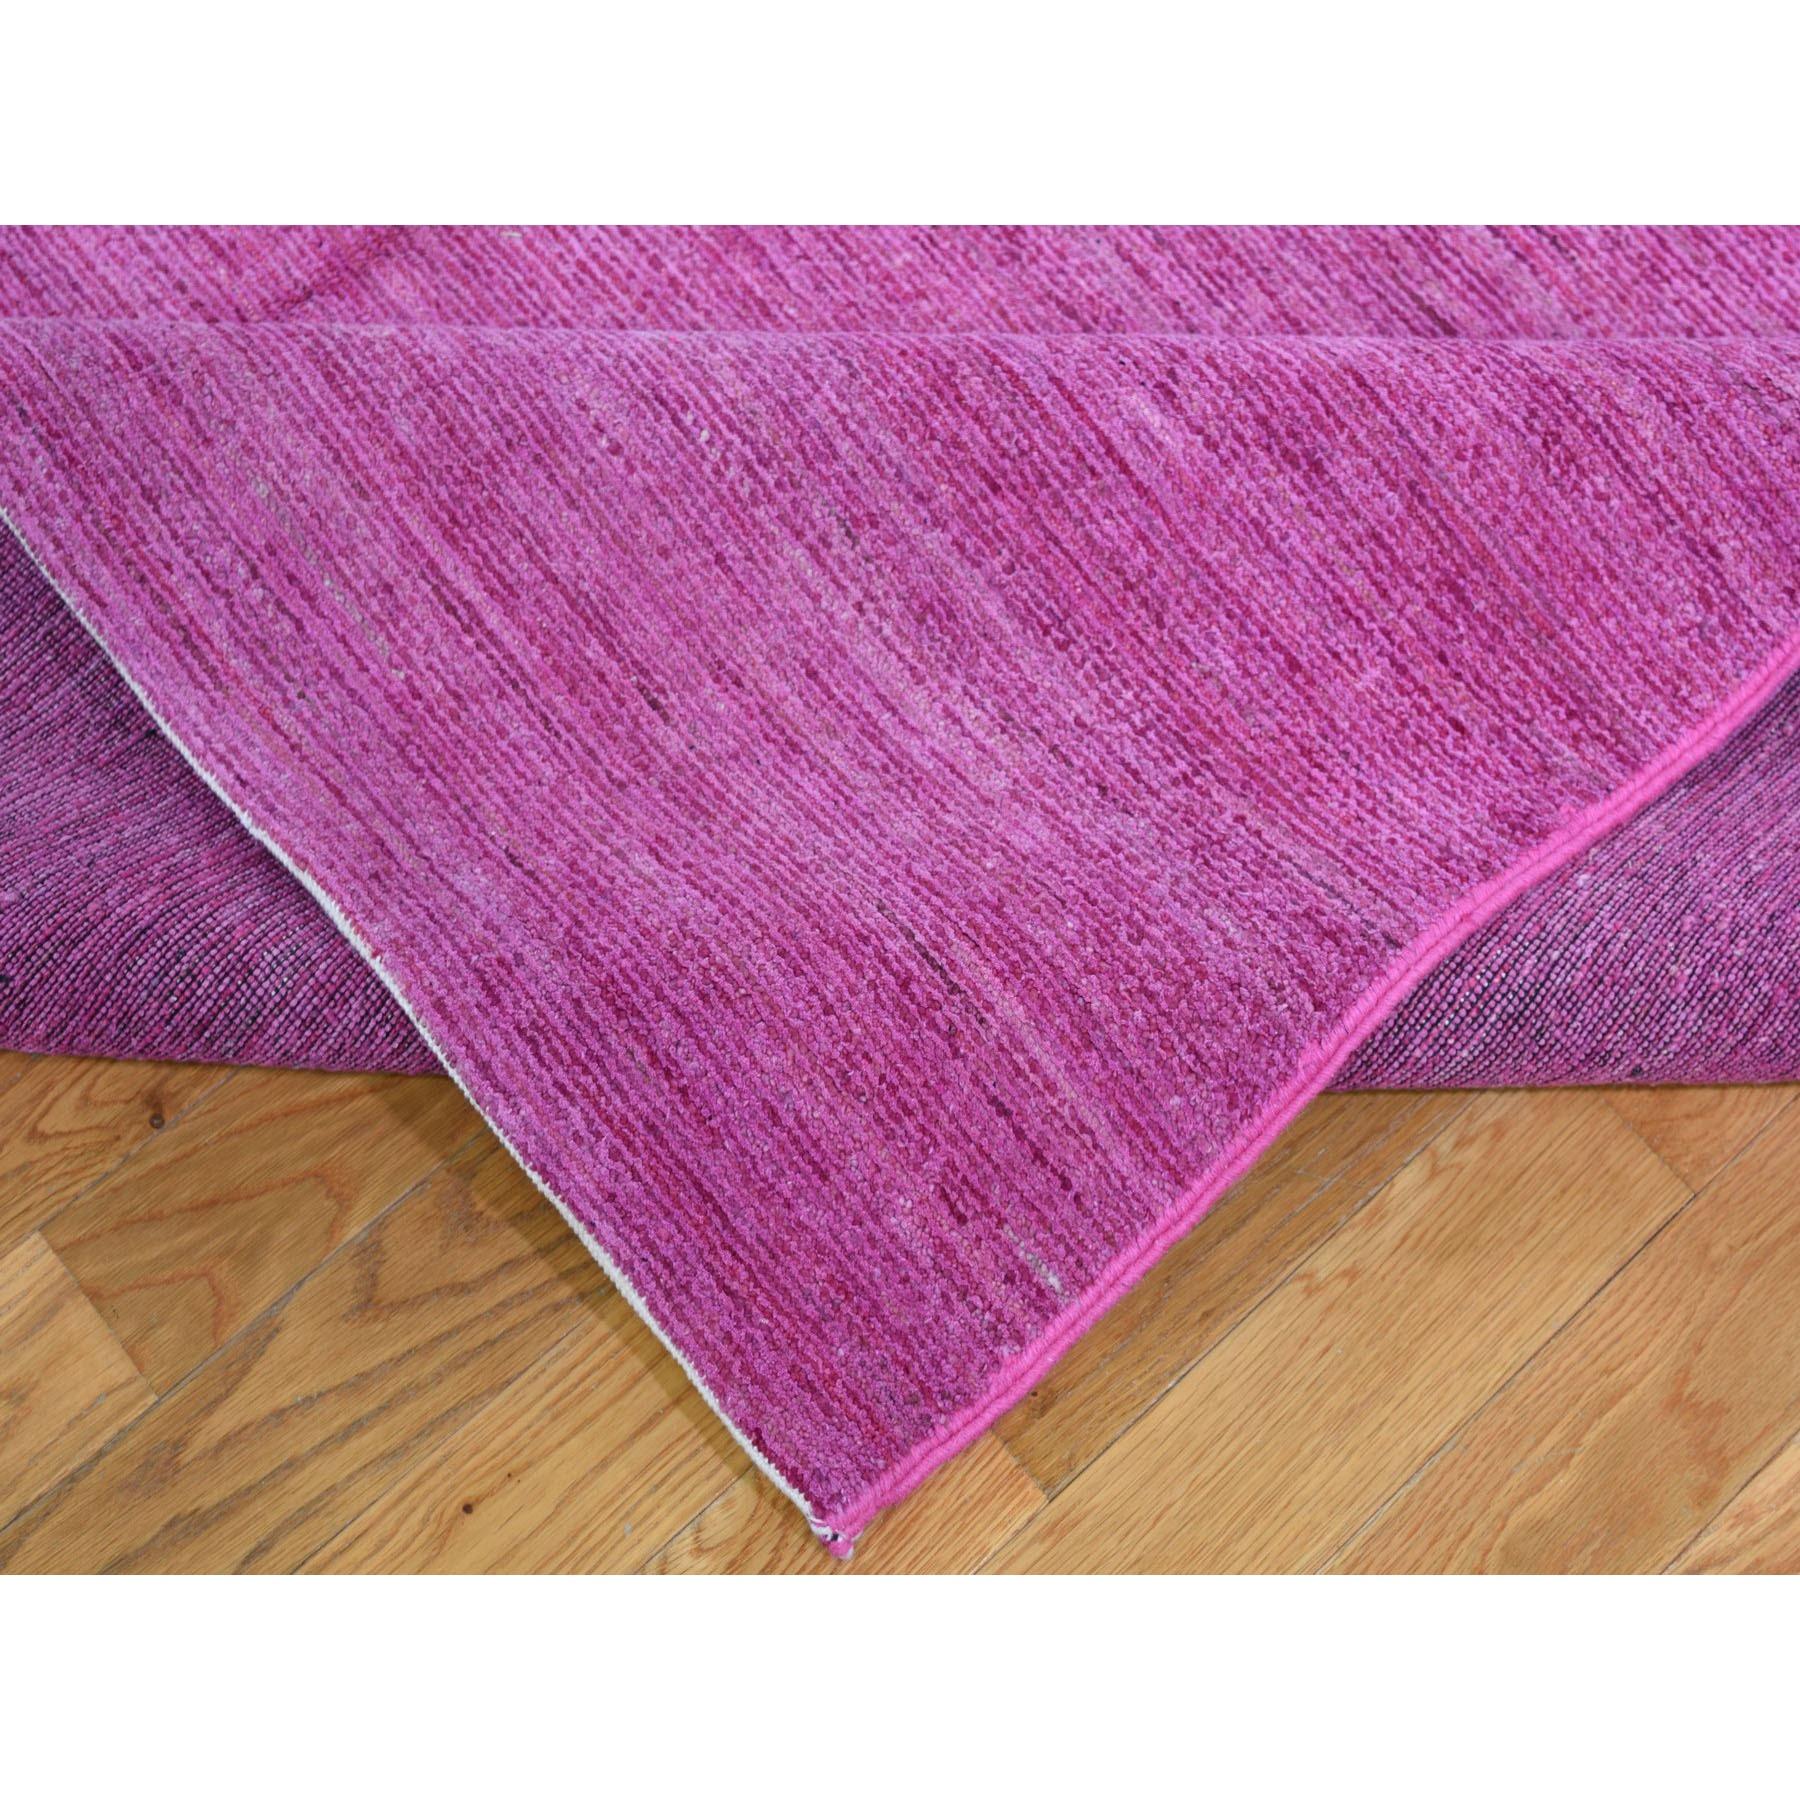 10'x14' Pink Pure Wool Pink Modern Gabbeh Oriental Rug Hand Knotted Oriental Rug